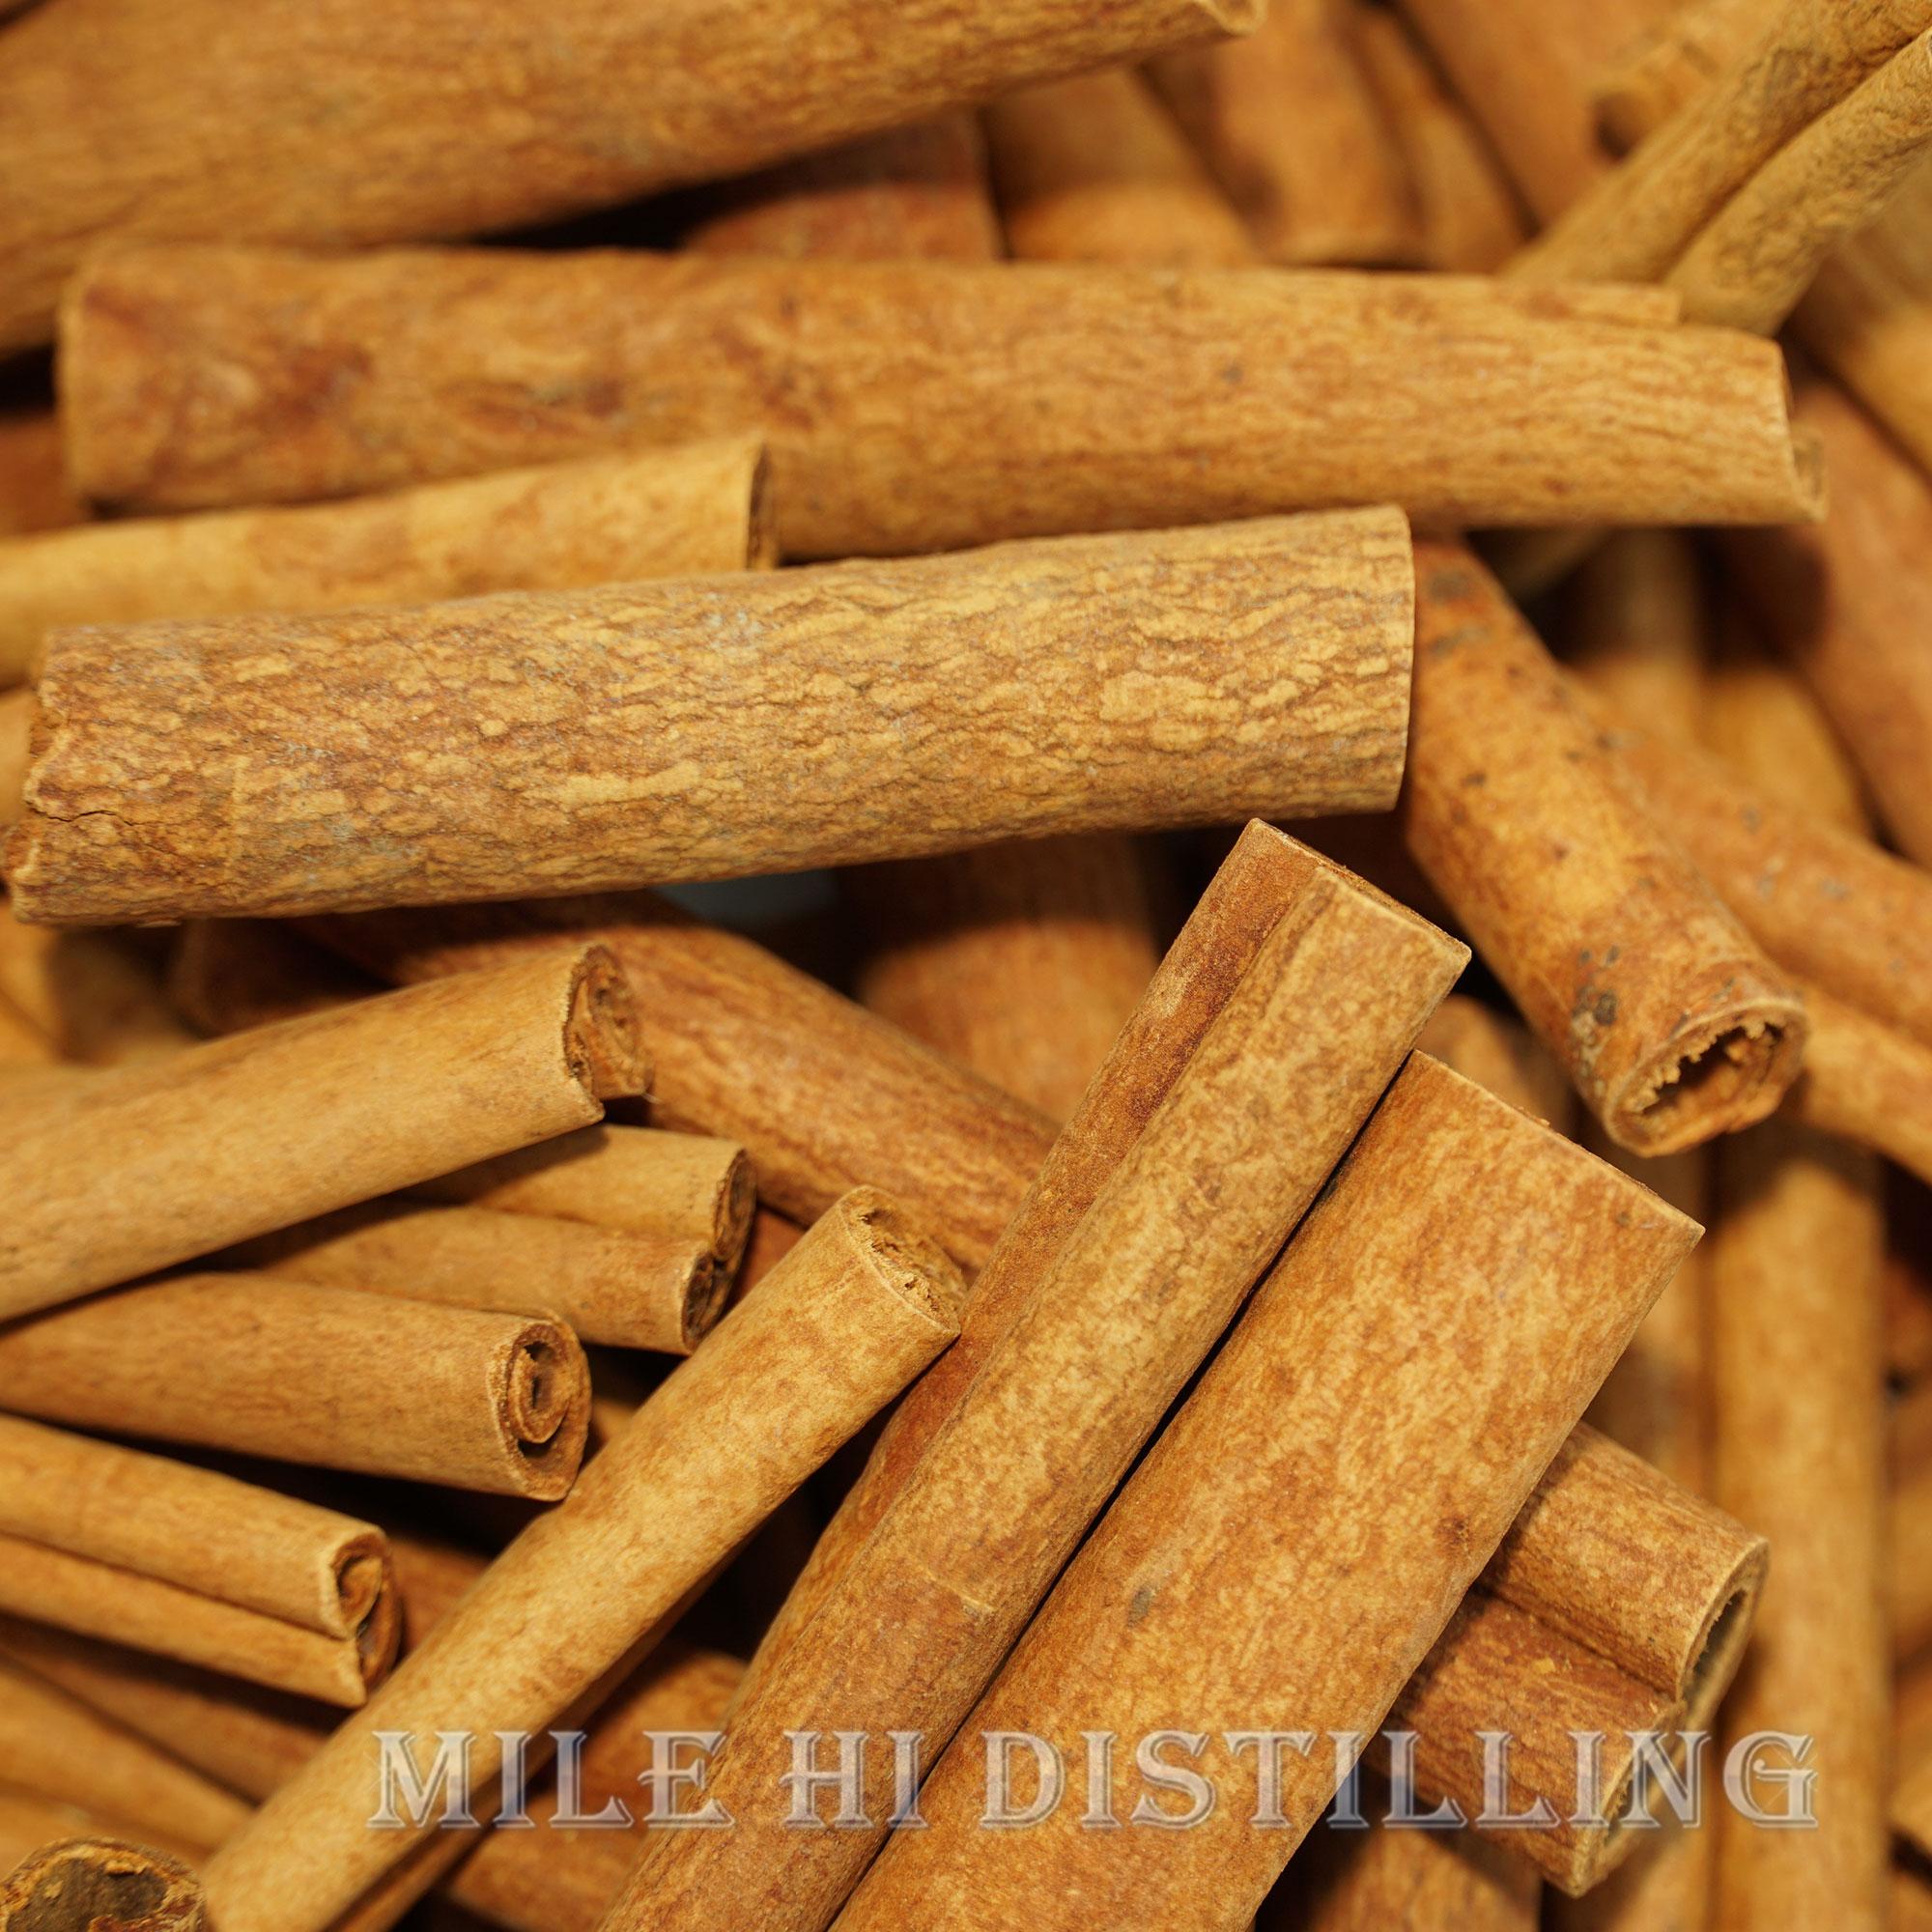 Cinnamon Sticks Distilling Supplies